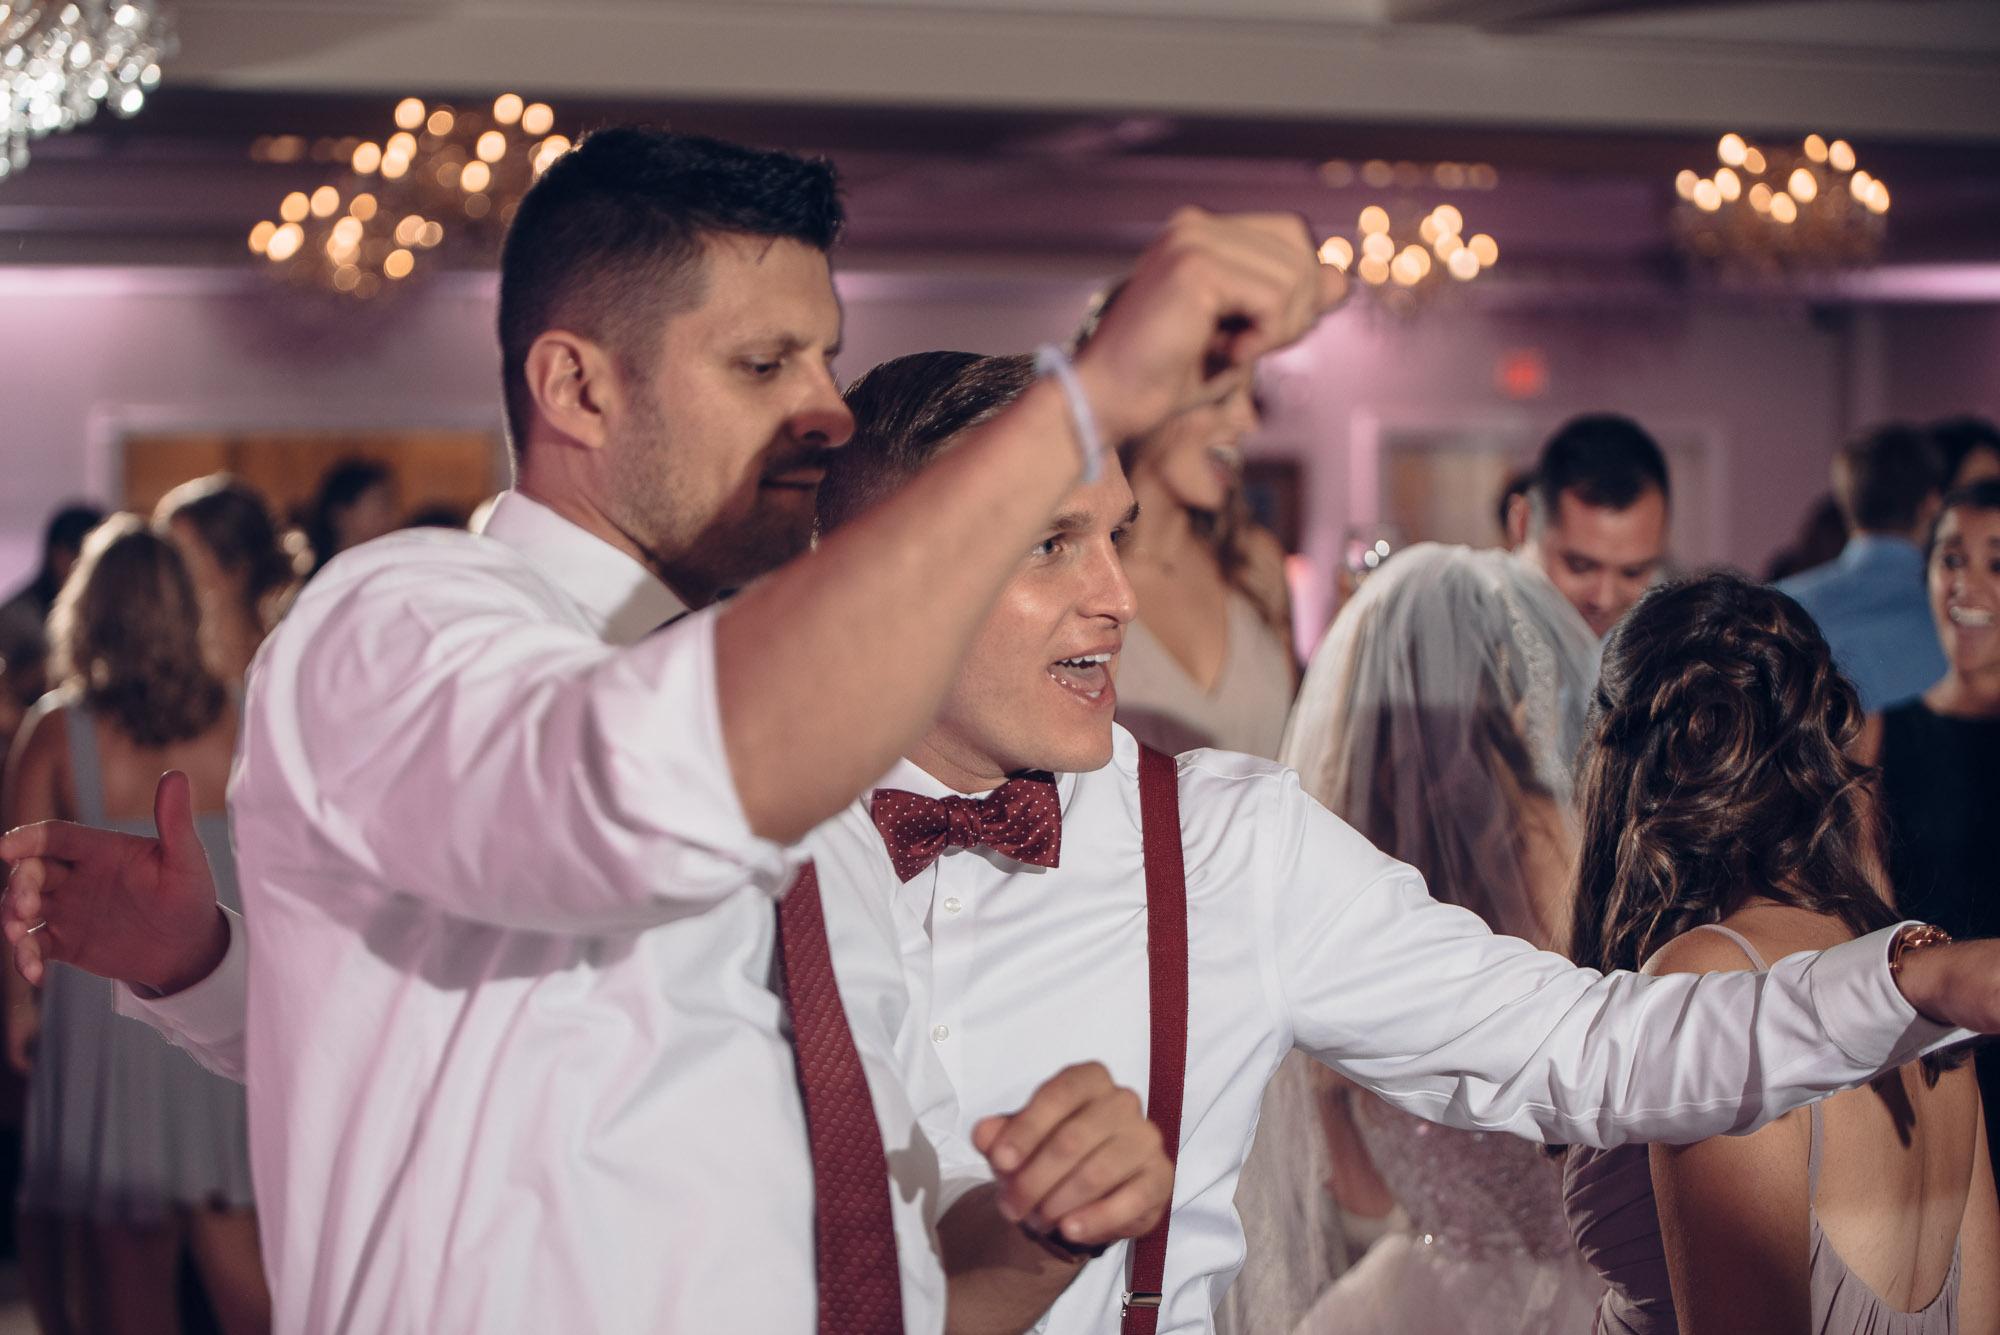 woodwinds_wedding_171020_web-68.jpg